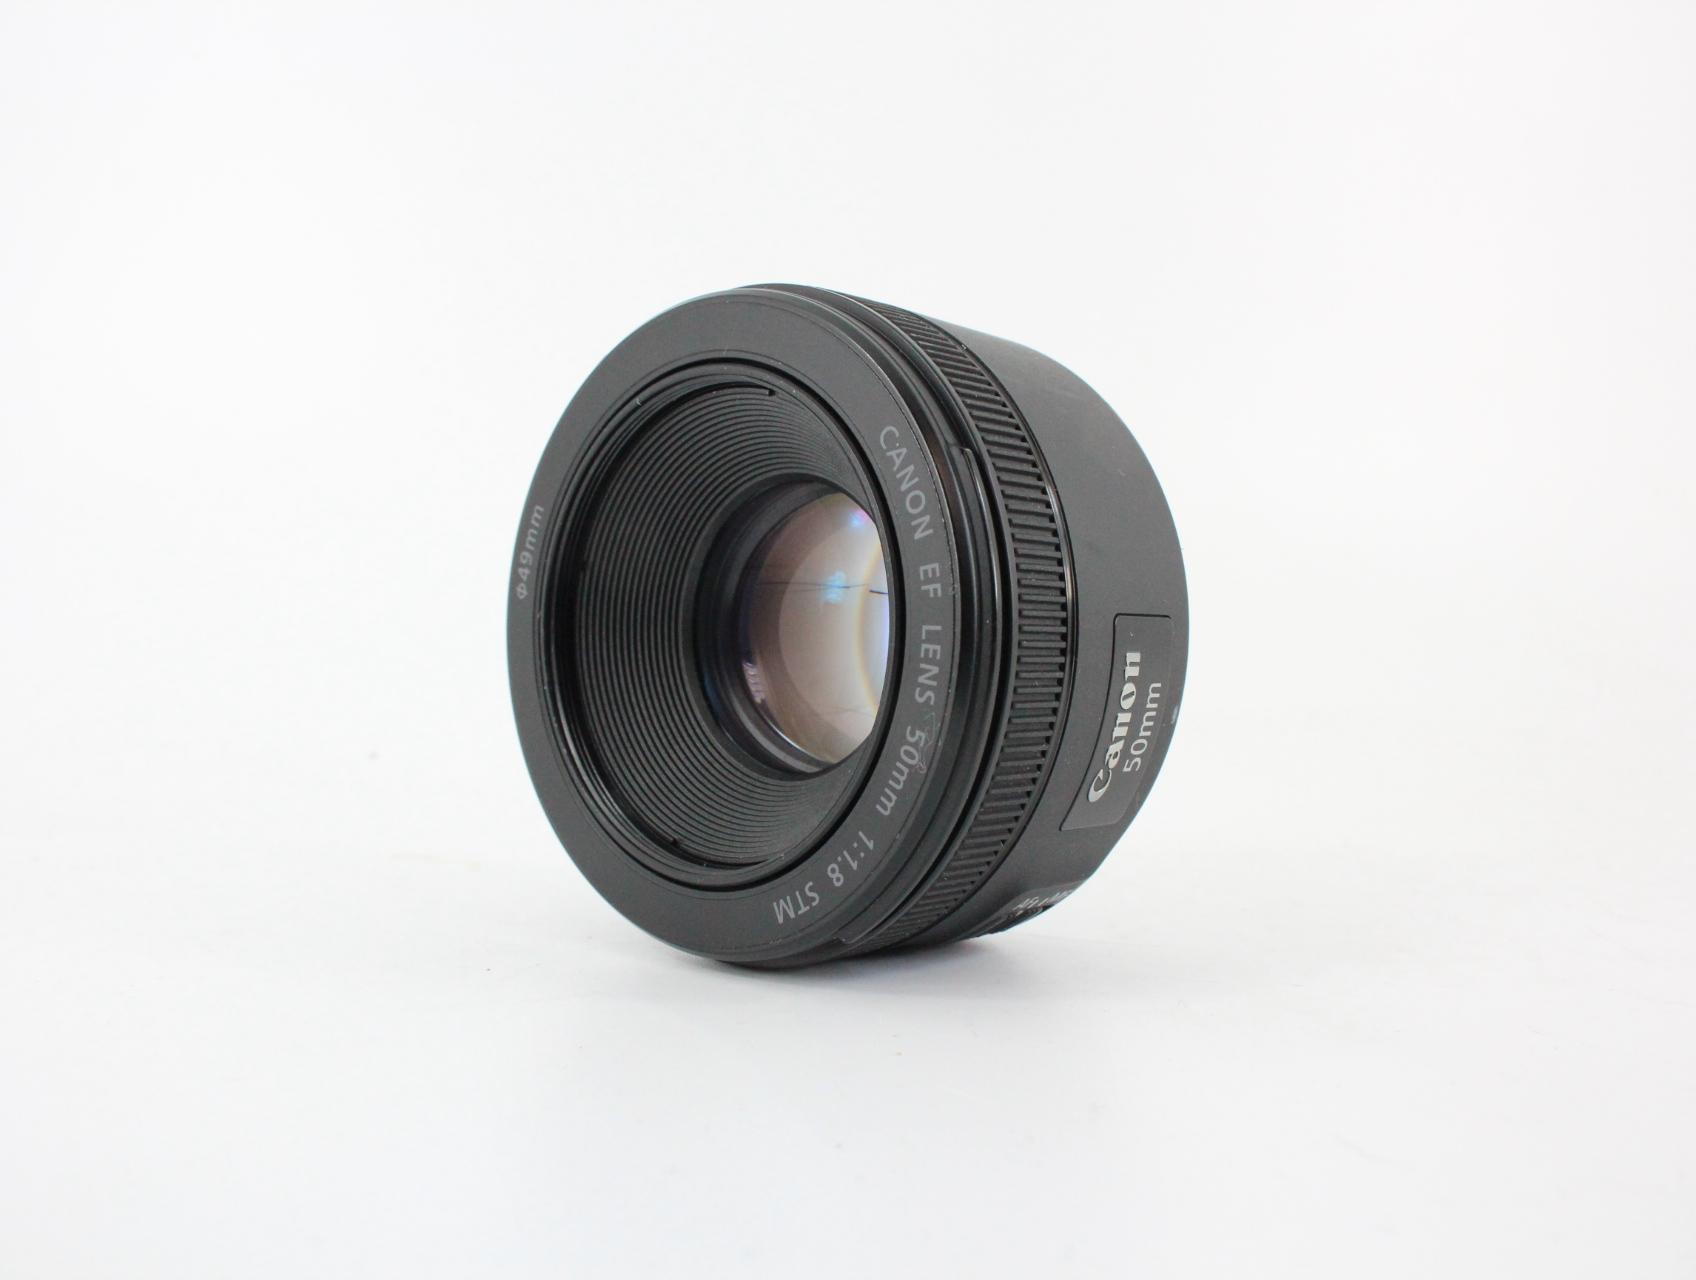 canon 50mm 2 image